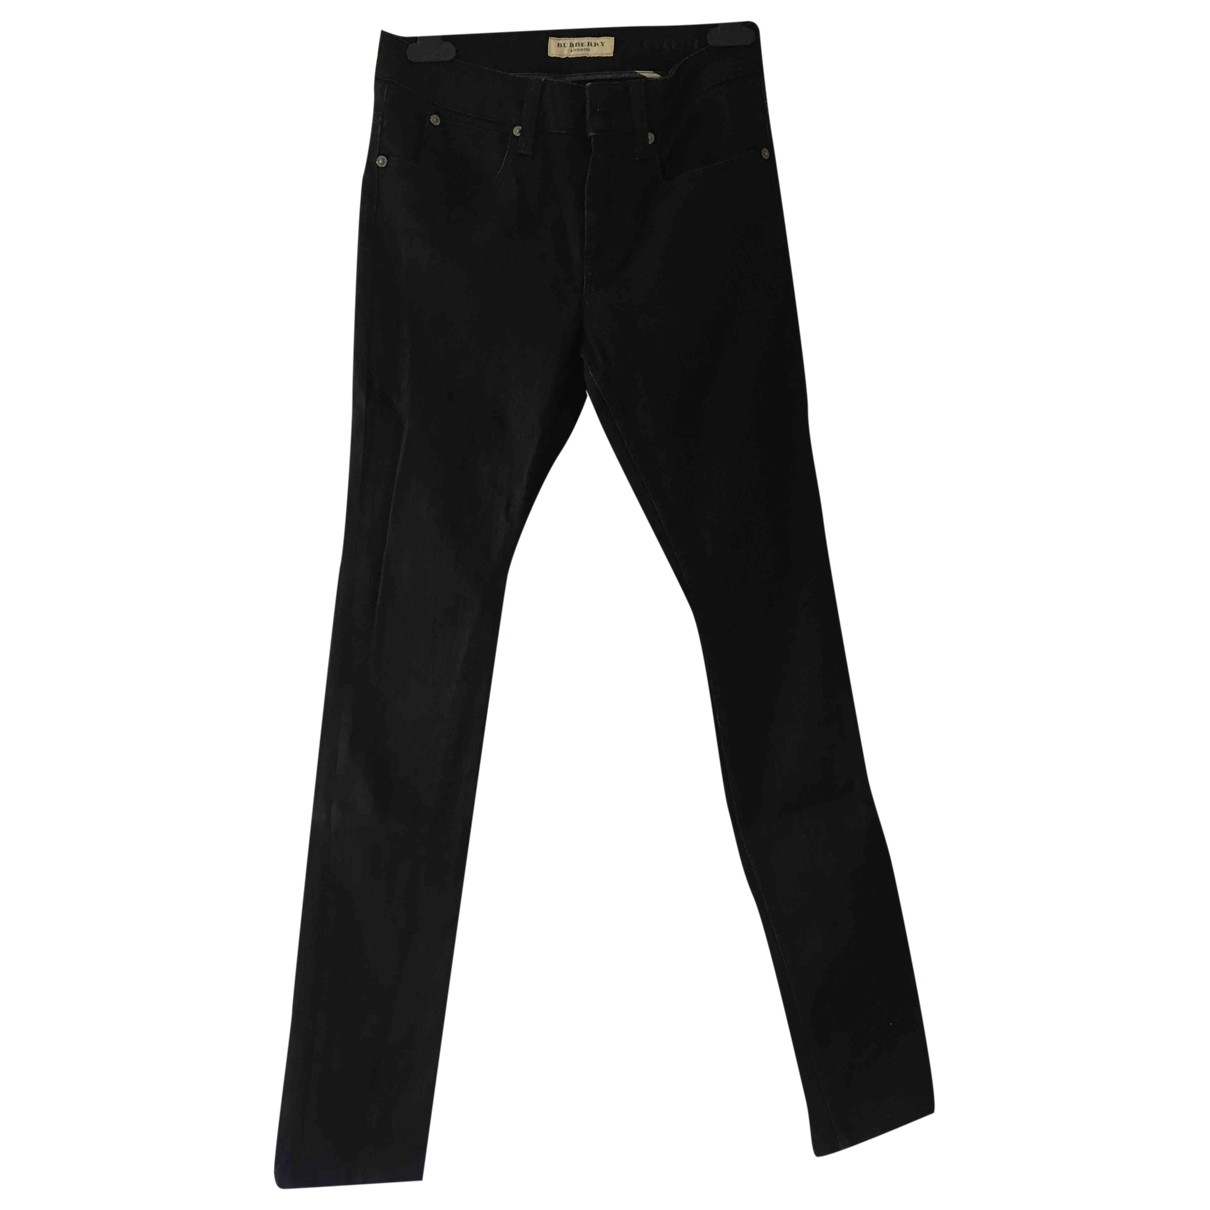 Burberry \N Black Cotton - elasthane Jeans for Women 26 US